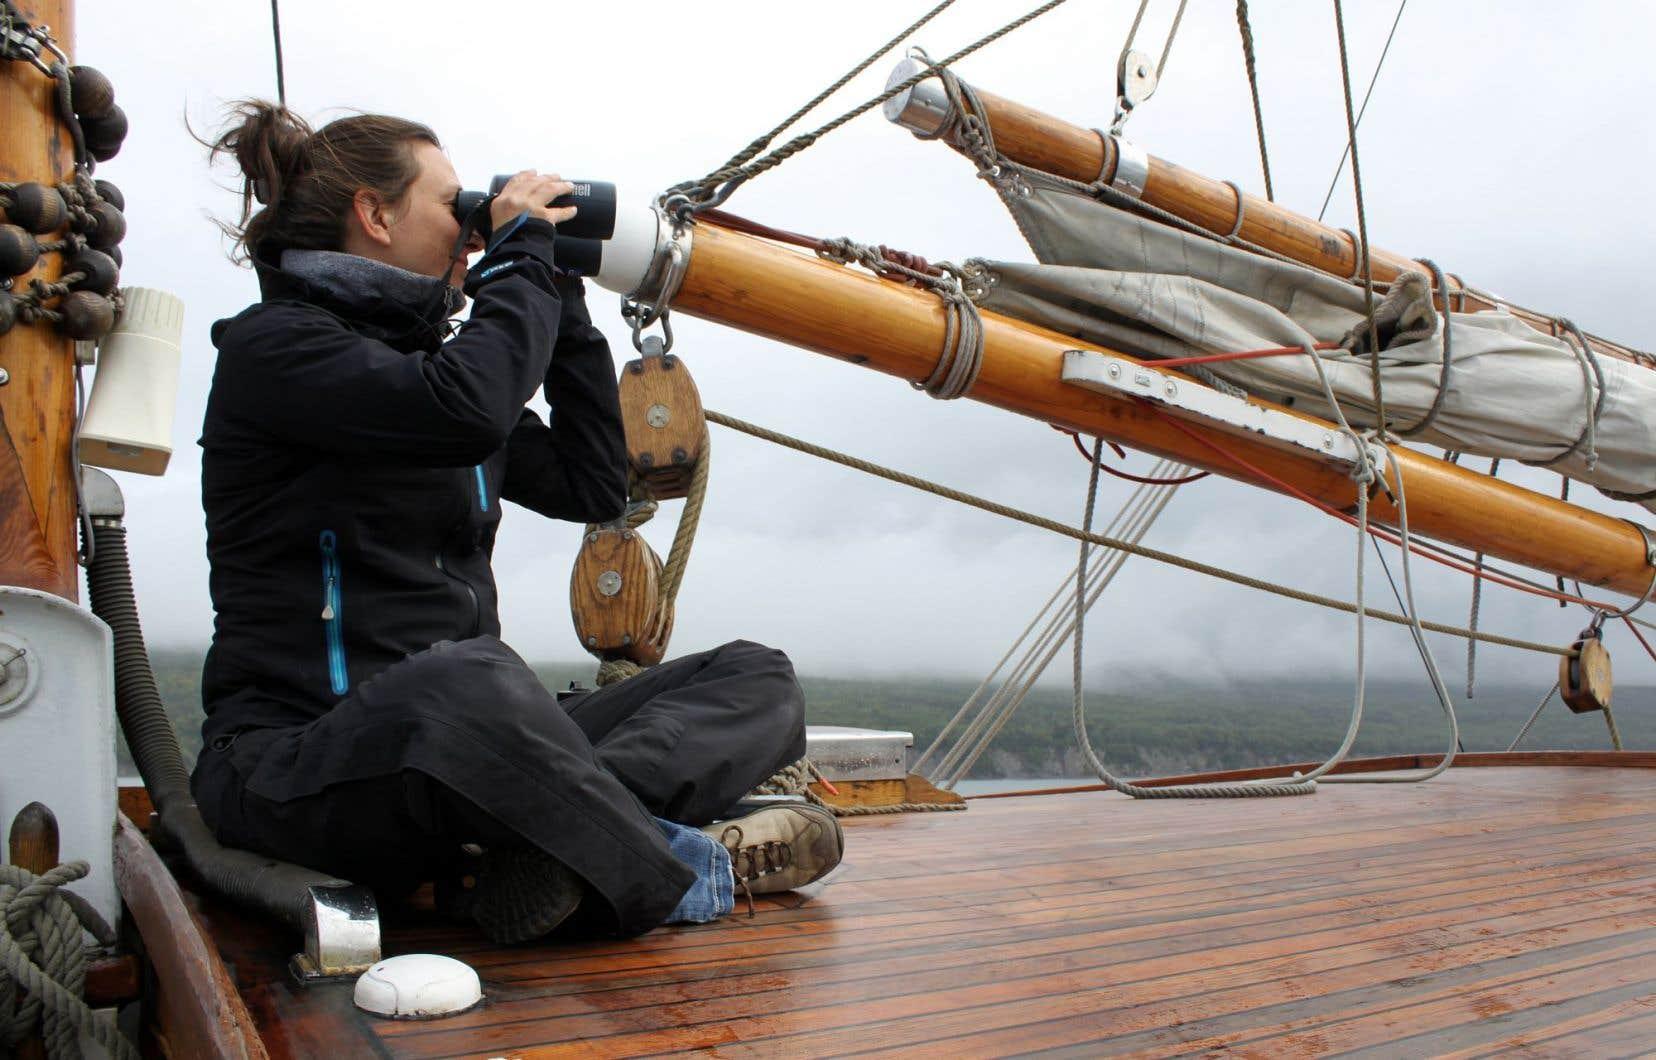 Sonia Giroux scrute l'horizon à la recherche de baleines.